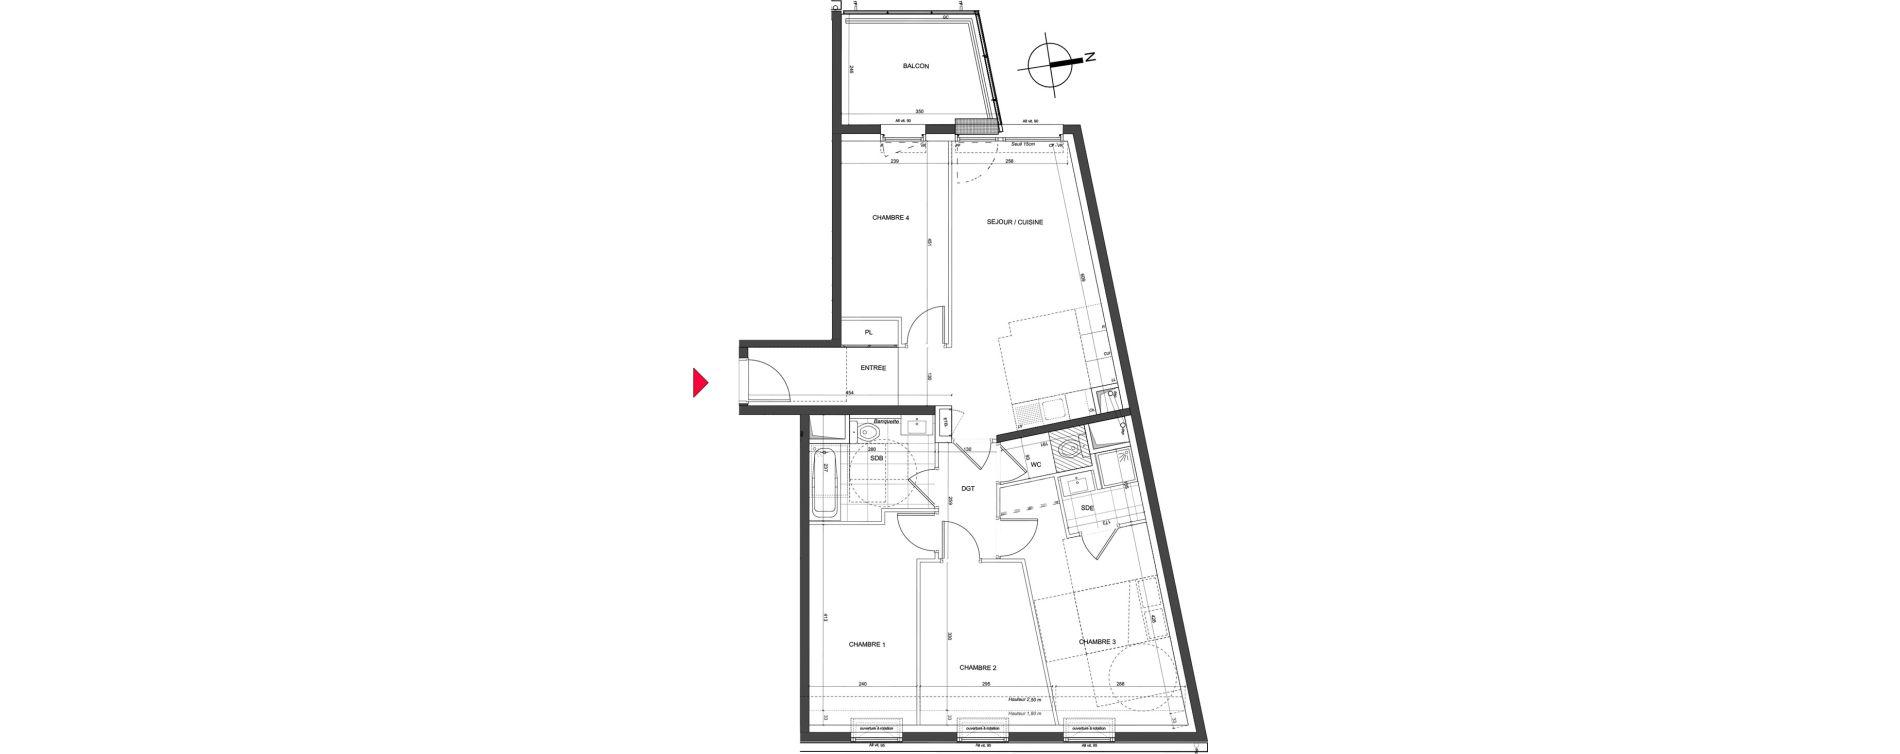 Appartement T5 de 83,13 m2 à Nancy Charles iii